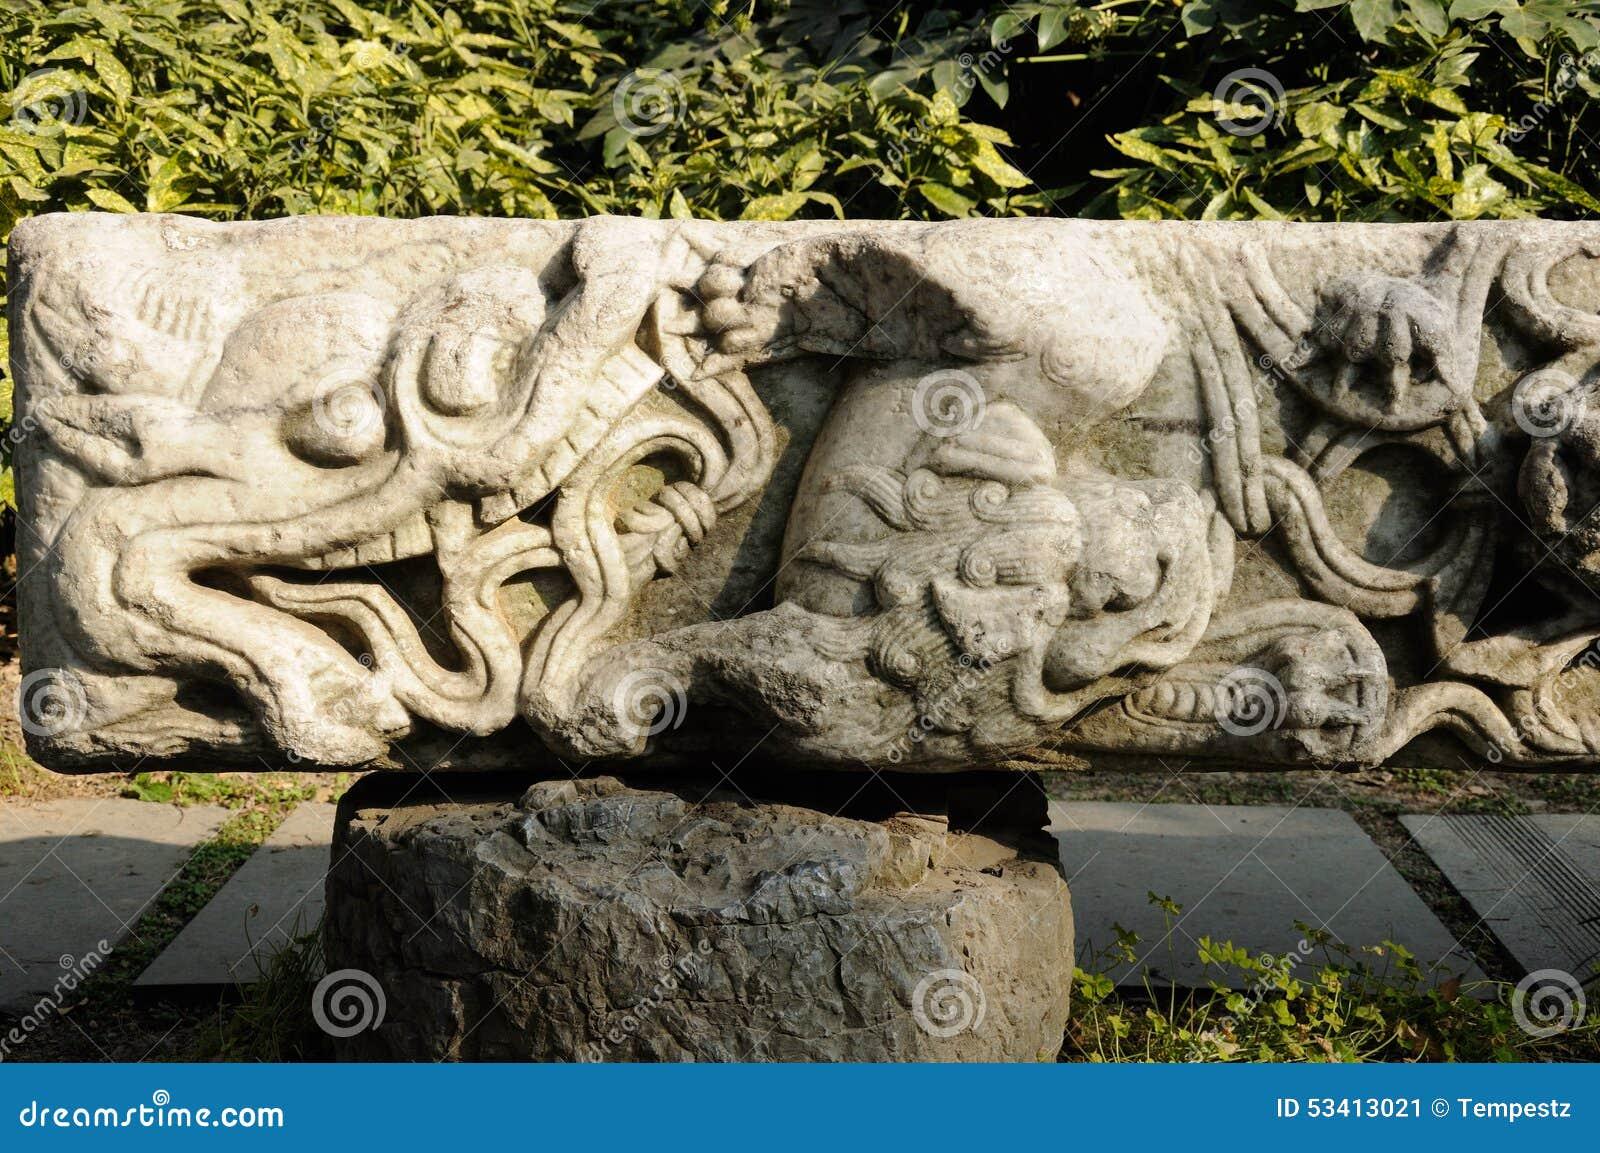 Dragon Stone Tablet